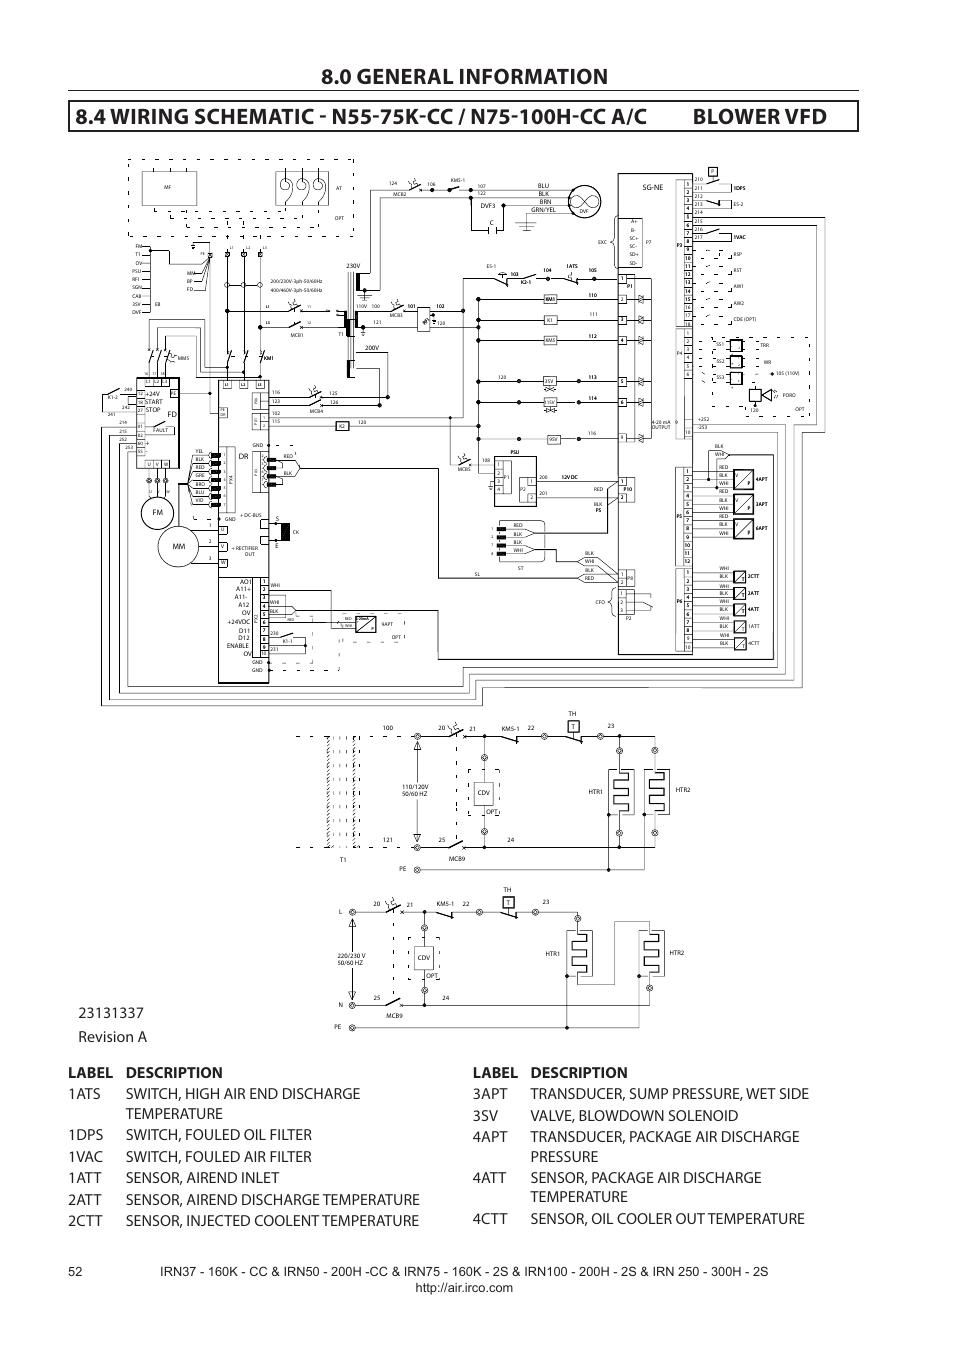 ingersoll rand nirvana irn75 160k 2s user manual page 54. Black Bedroom Furniture Sets. Home Design Ideas